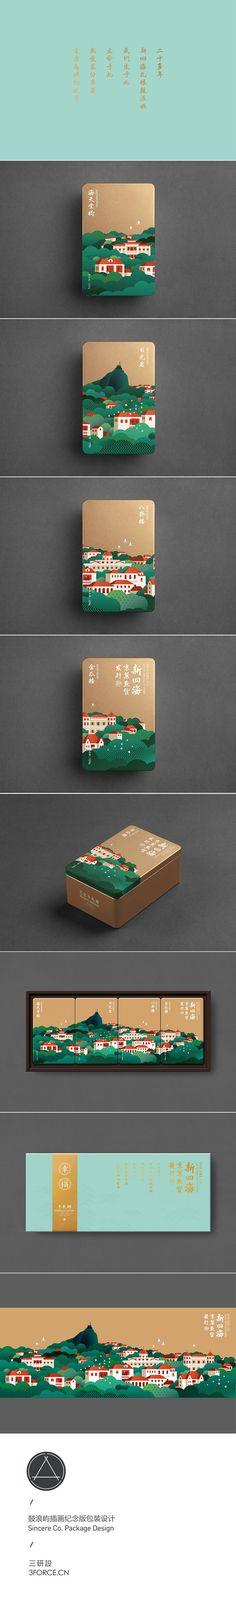 Sincere Co. Nougat Packaging / 新四海牛軋糖包裝設計 on Behance Stop by my Etsy Shop: www.etsy.com/shop/TeoldDesign